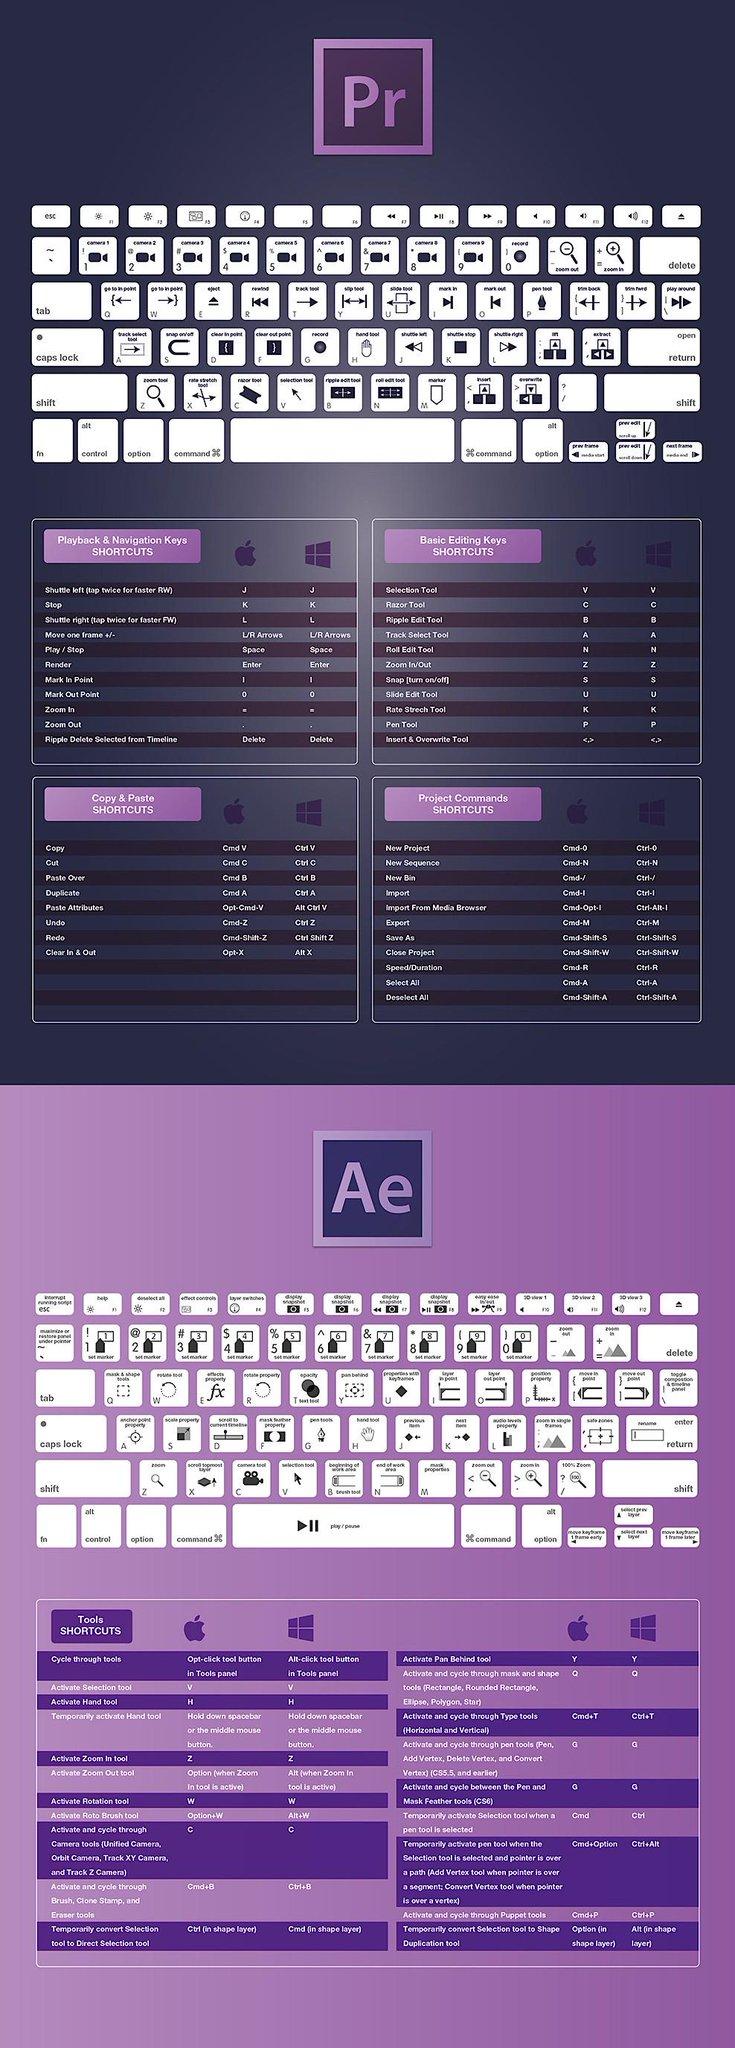 Creativeschoolarabia On Twitter جميع اختصارات لوحة المفاتيح في برنامج ادوبي بريمير وبرنامج ادوبي افتر افكت Csa Adobe Premierepro Aftereffects Http T Co Xbsxkgmosm